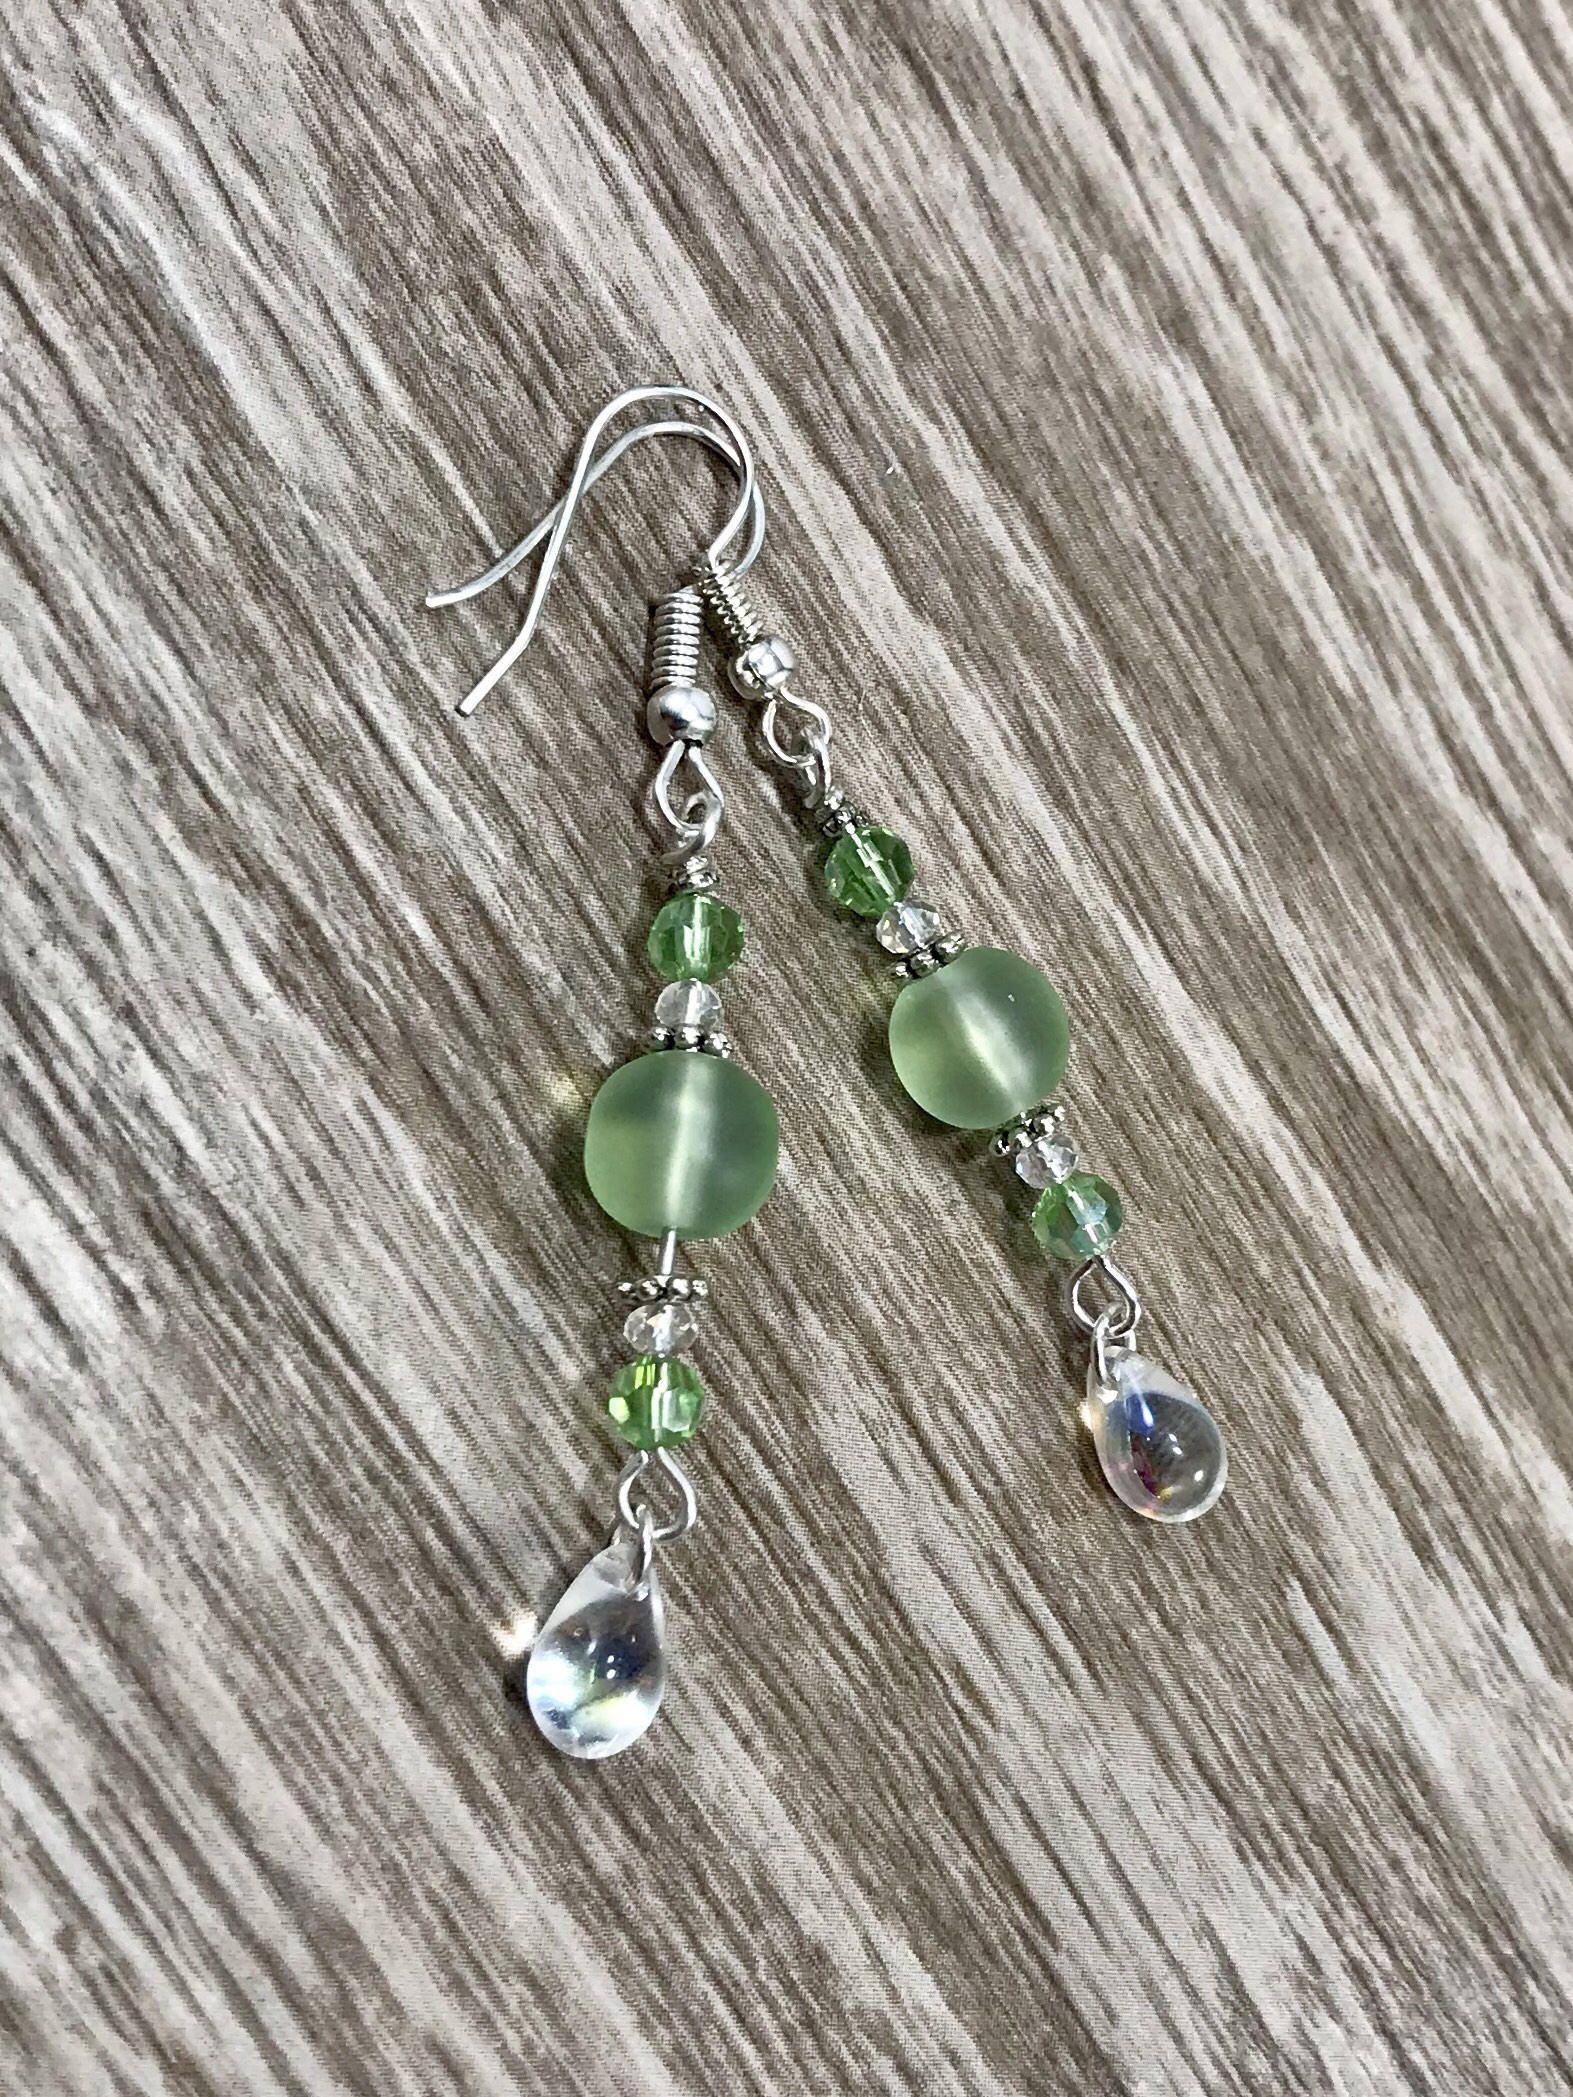 Green Glass Lever Back Earrings Beachy Jewelry Gift Idea